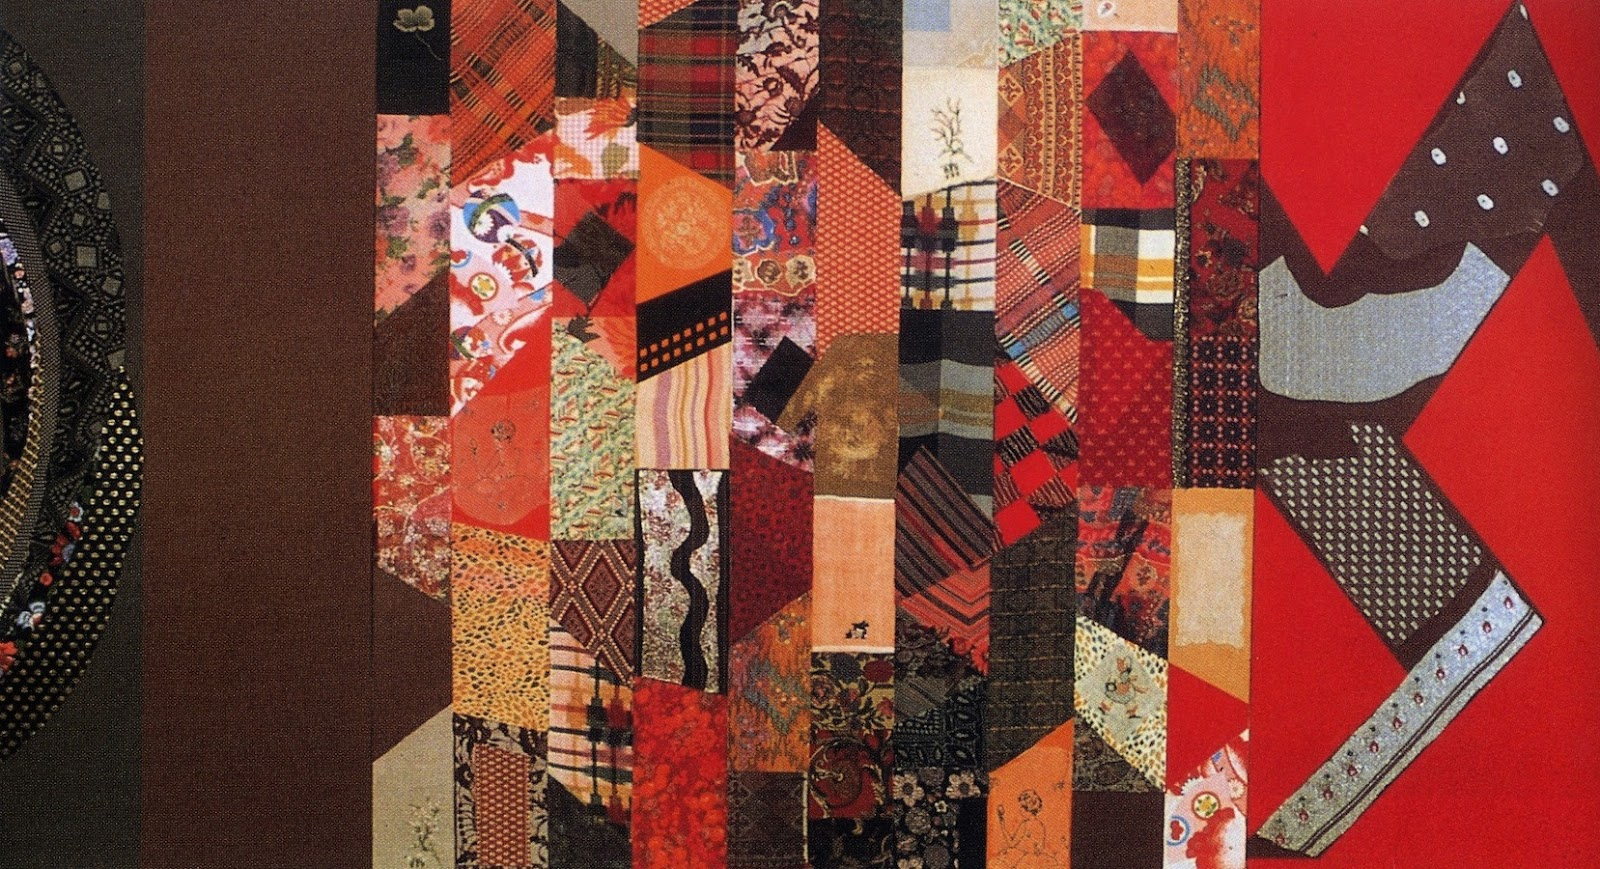 Inspired by Women Artists Part 3: Miriam Schapiro